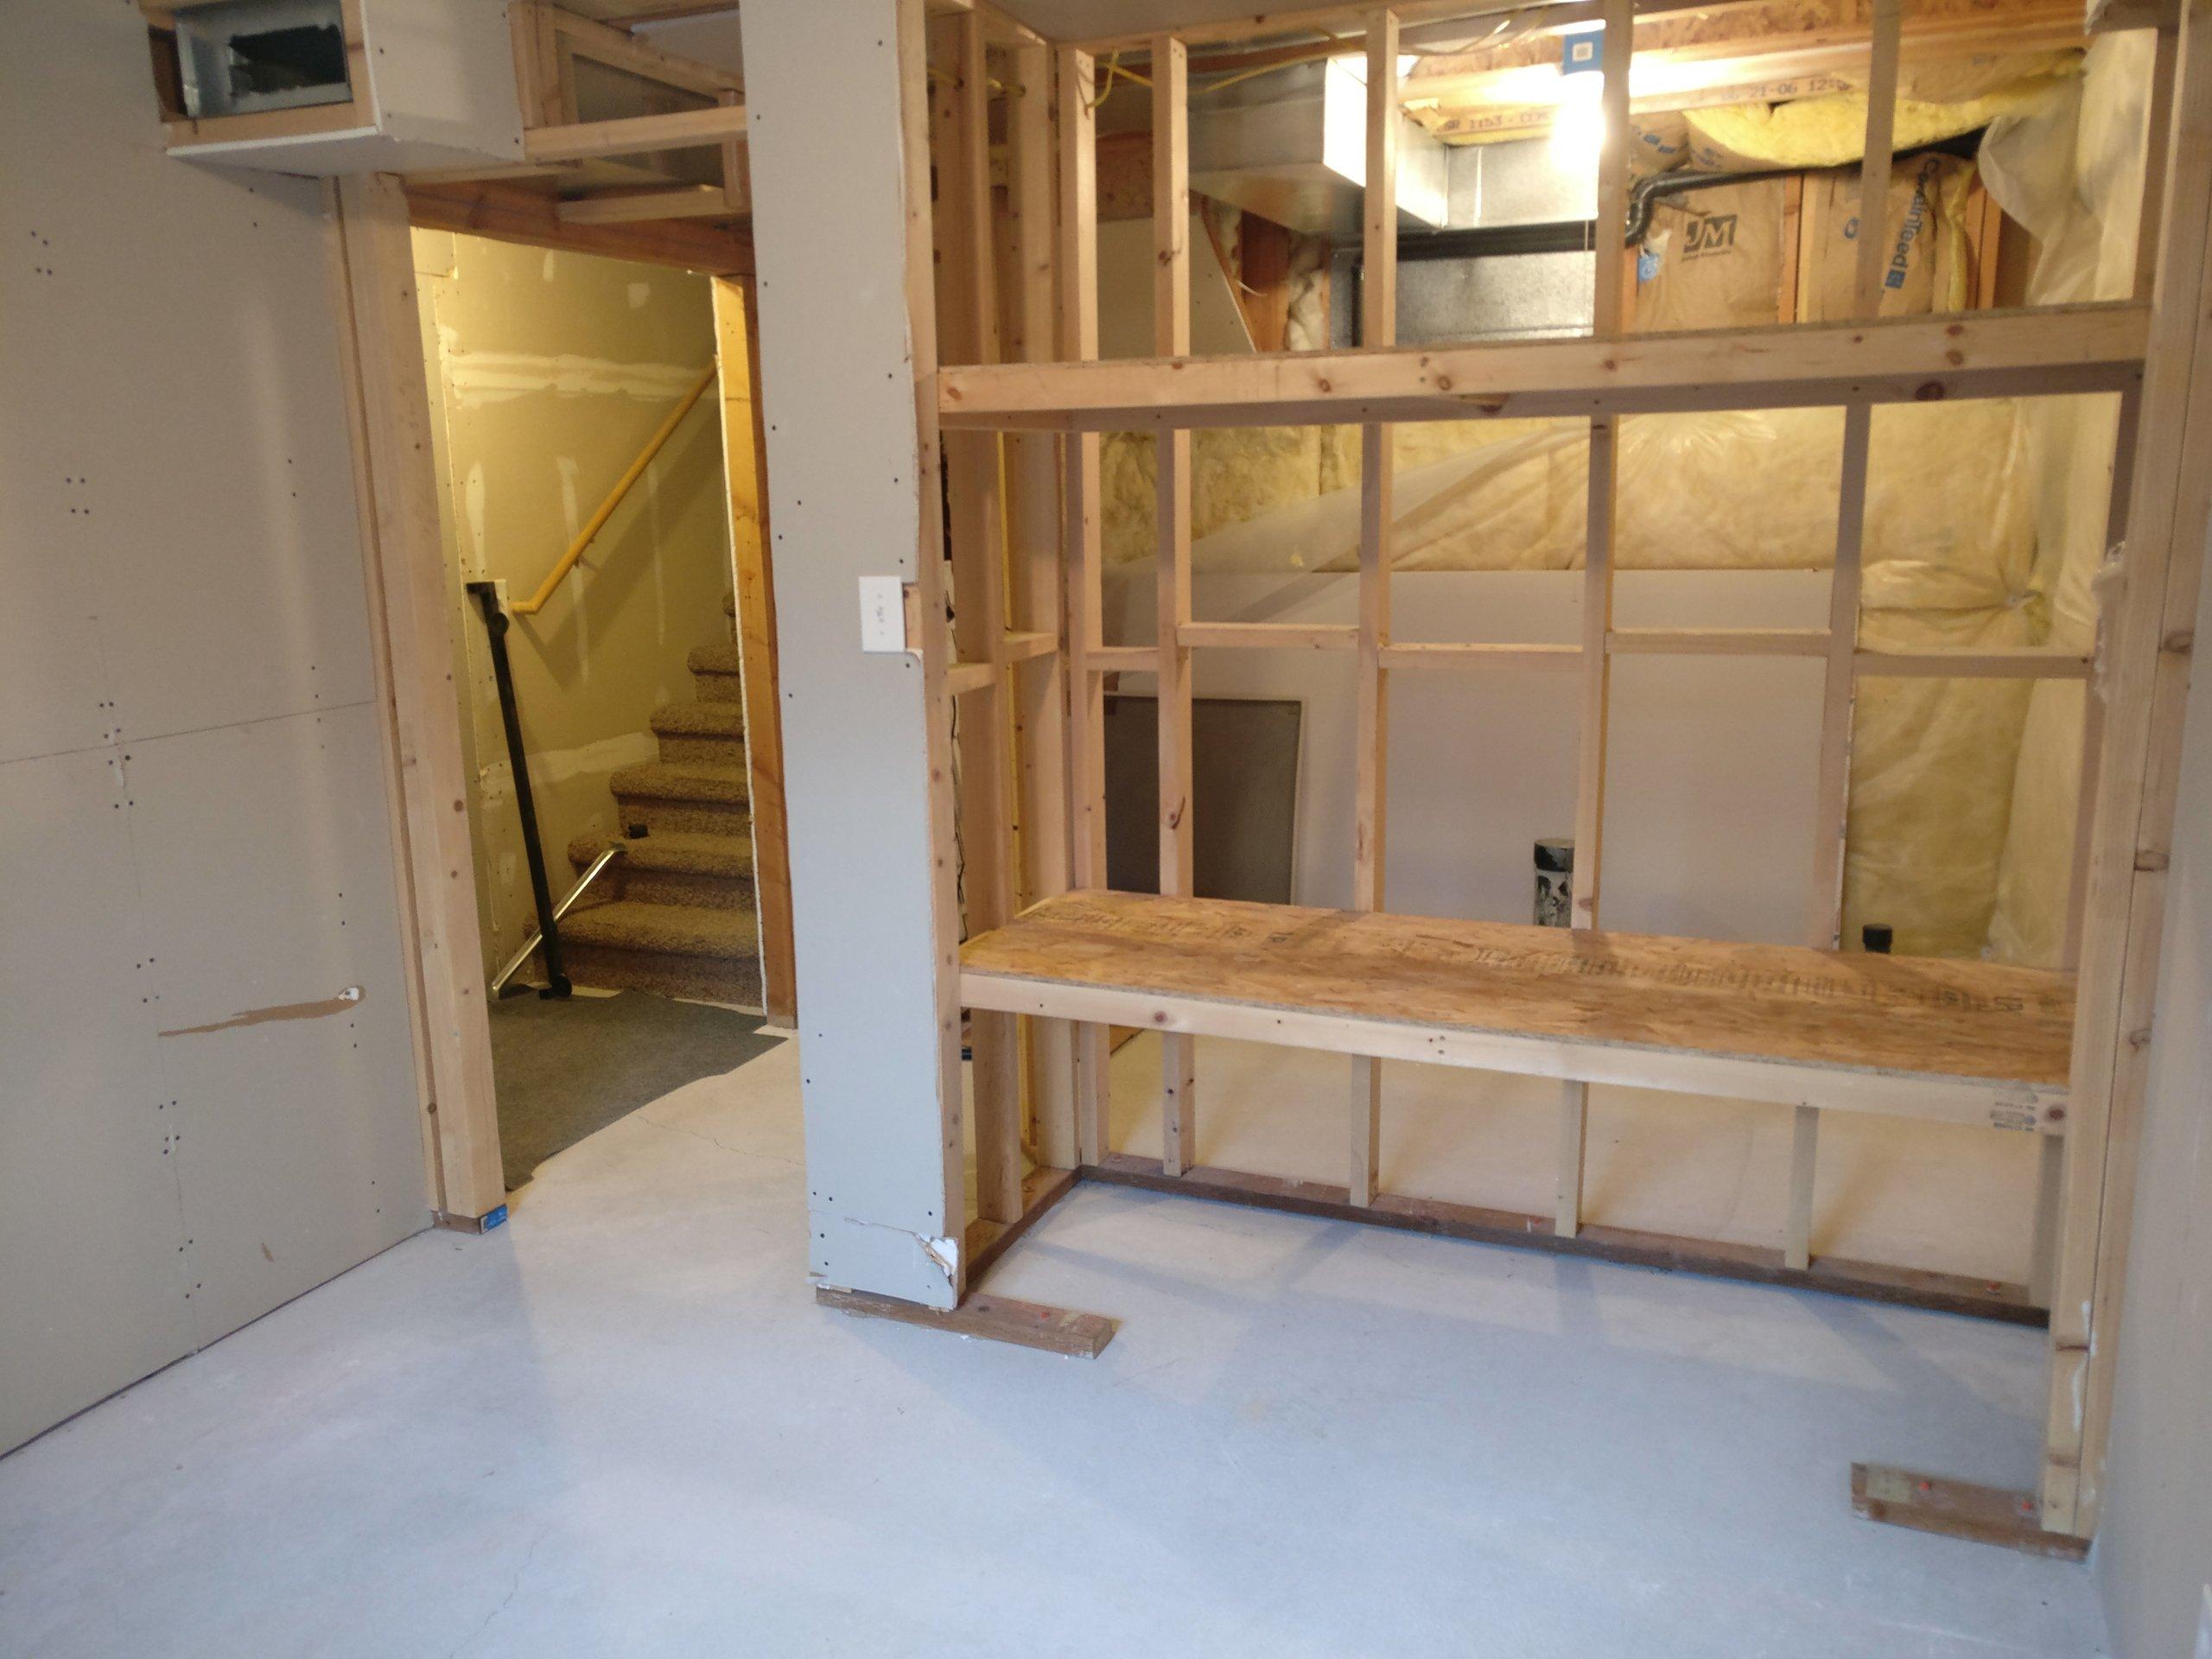 9x9 Basement self storage unit